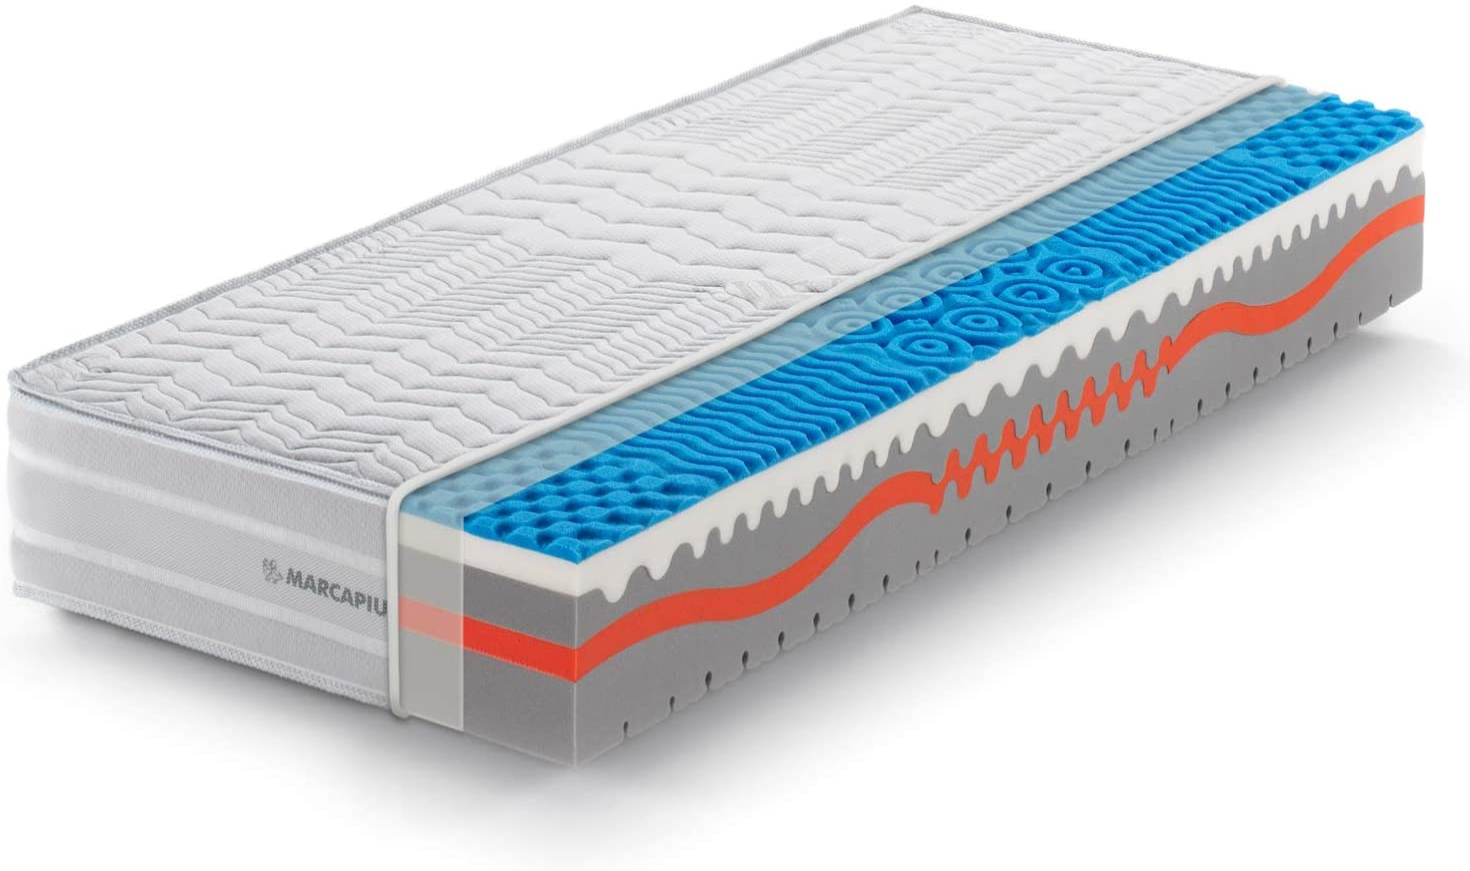 Marcapiuma - Colchón viscoelástico Individual Memory 90x180 Alto 25 cm - Sunshine - firmeza H2 Medio 9 Zonas - Producto Sanitario CE - Funda desenfundable Silver Antiácaros 100% Fabricado en Italia